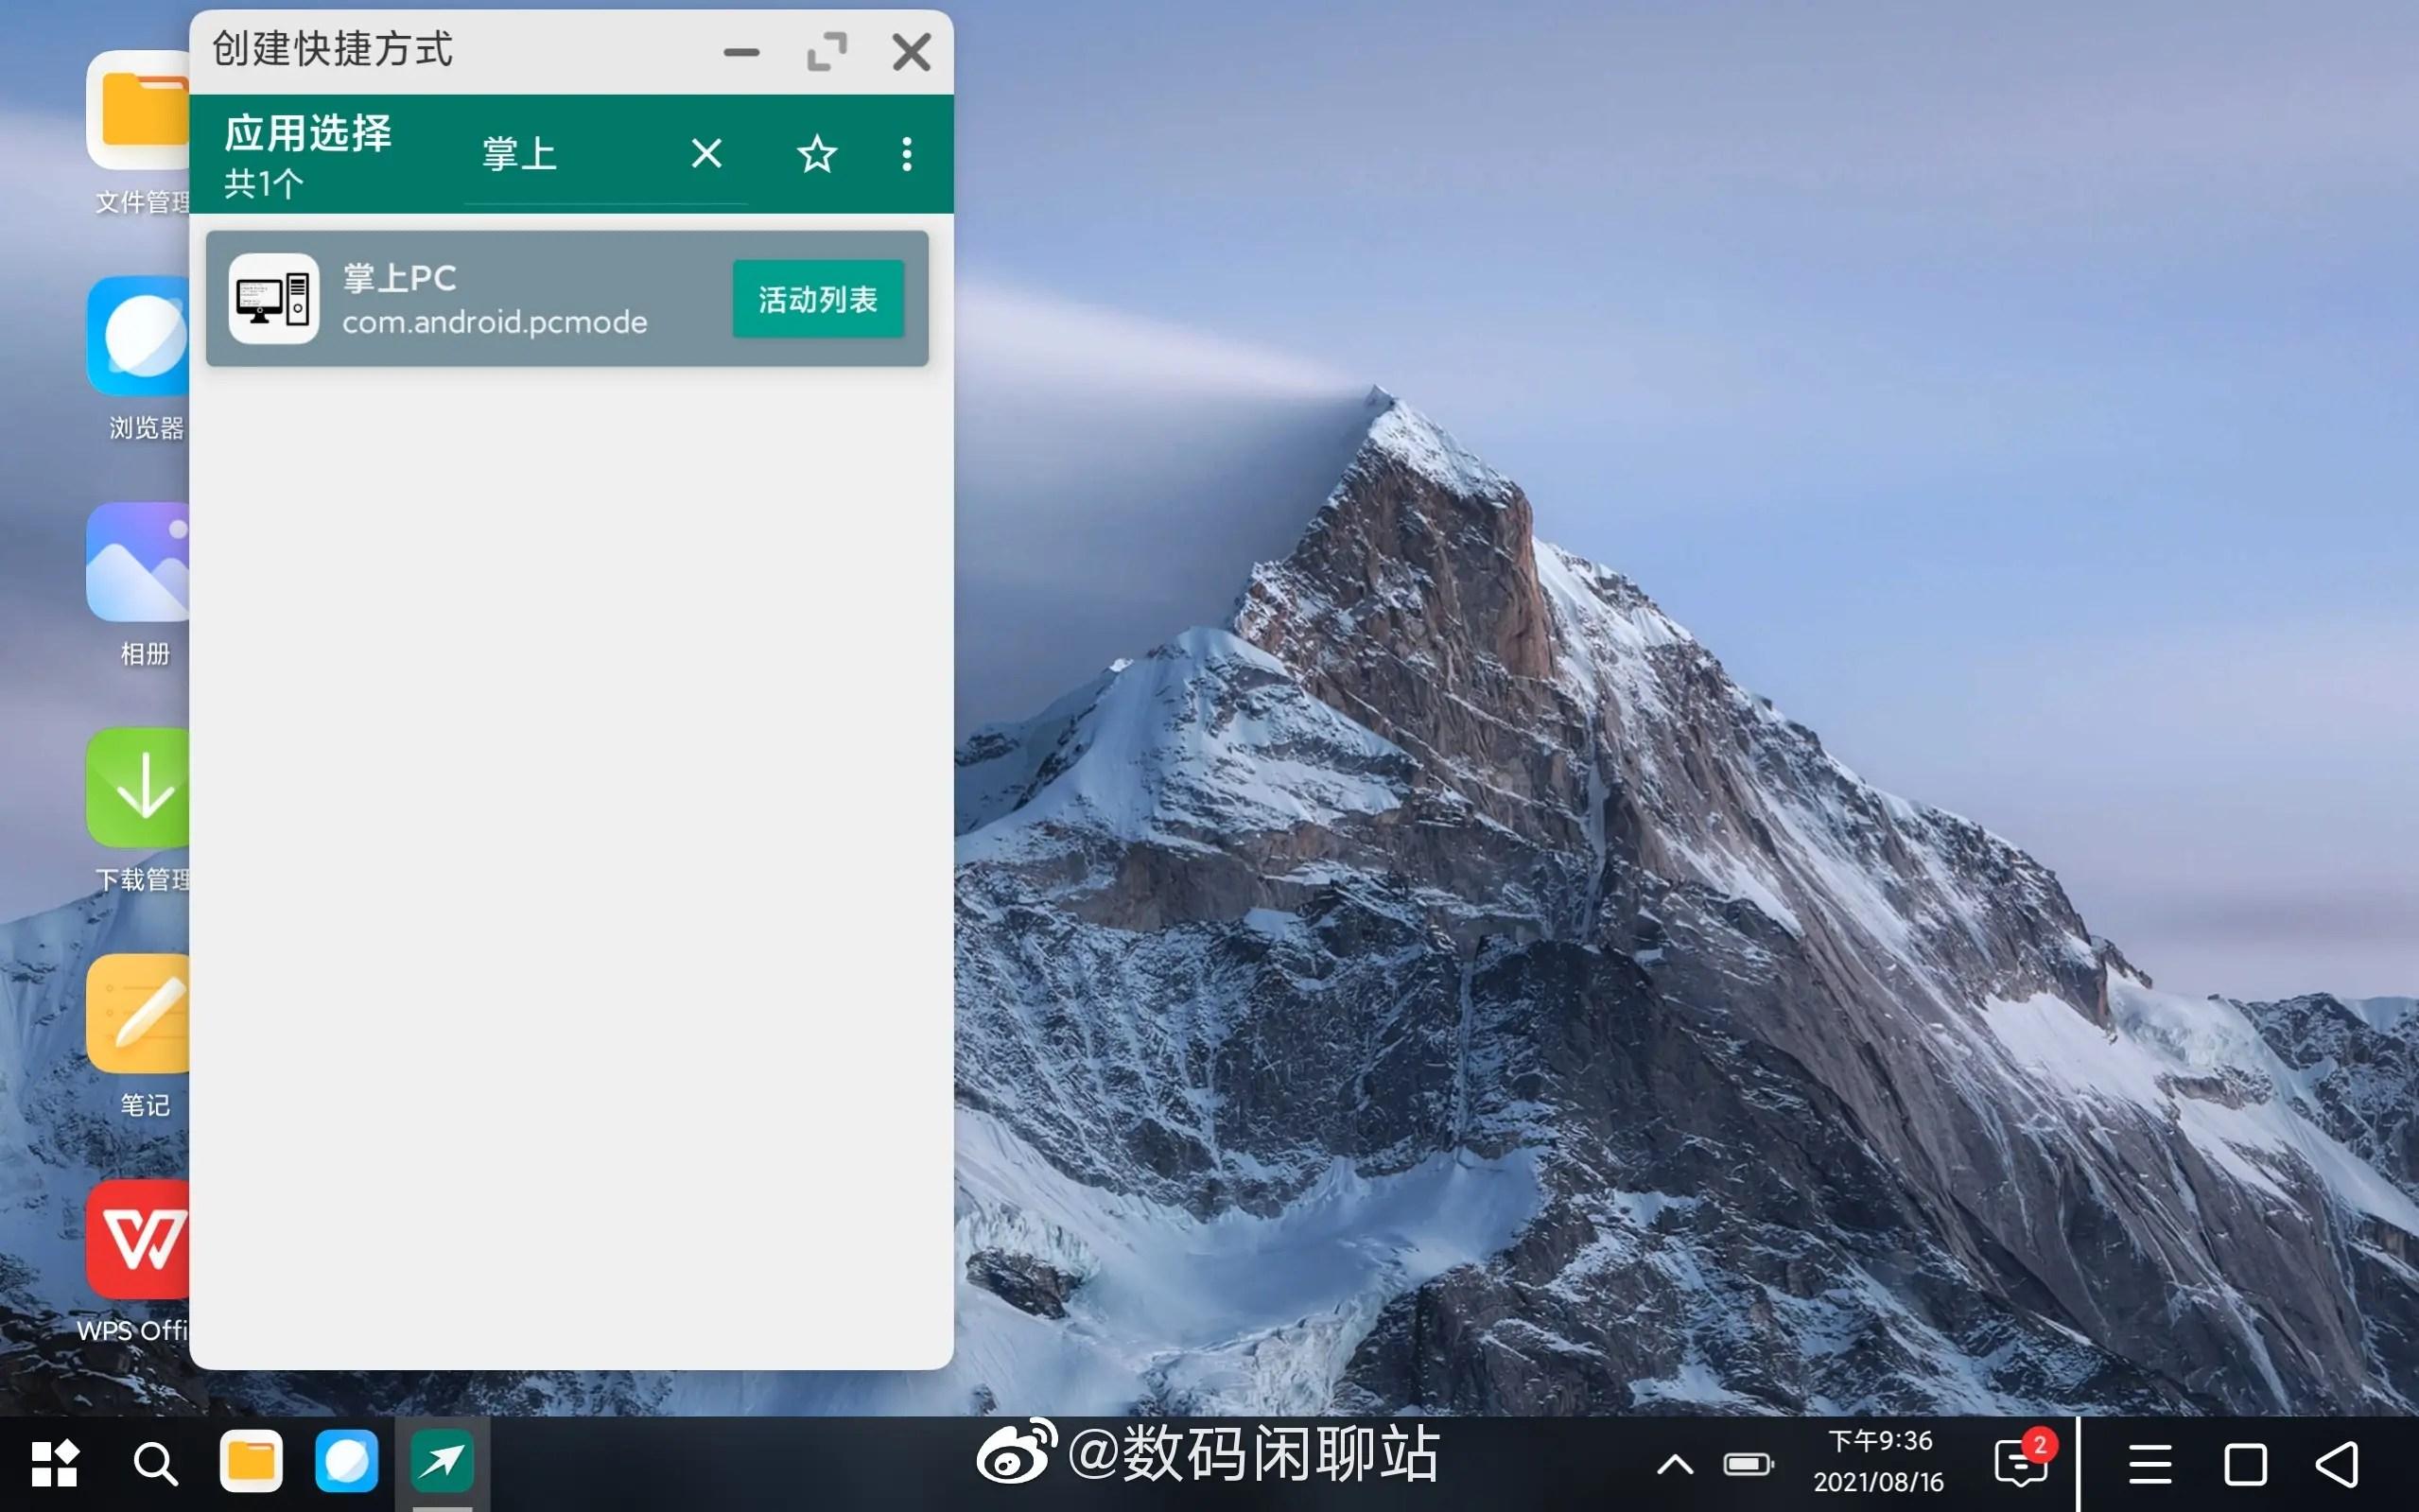 Xiaomi Tablet 5 Pro PC Mode